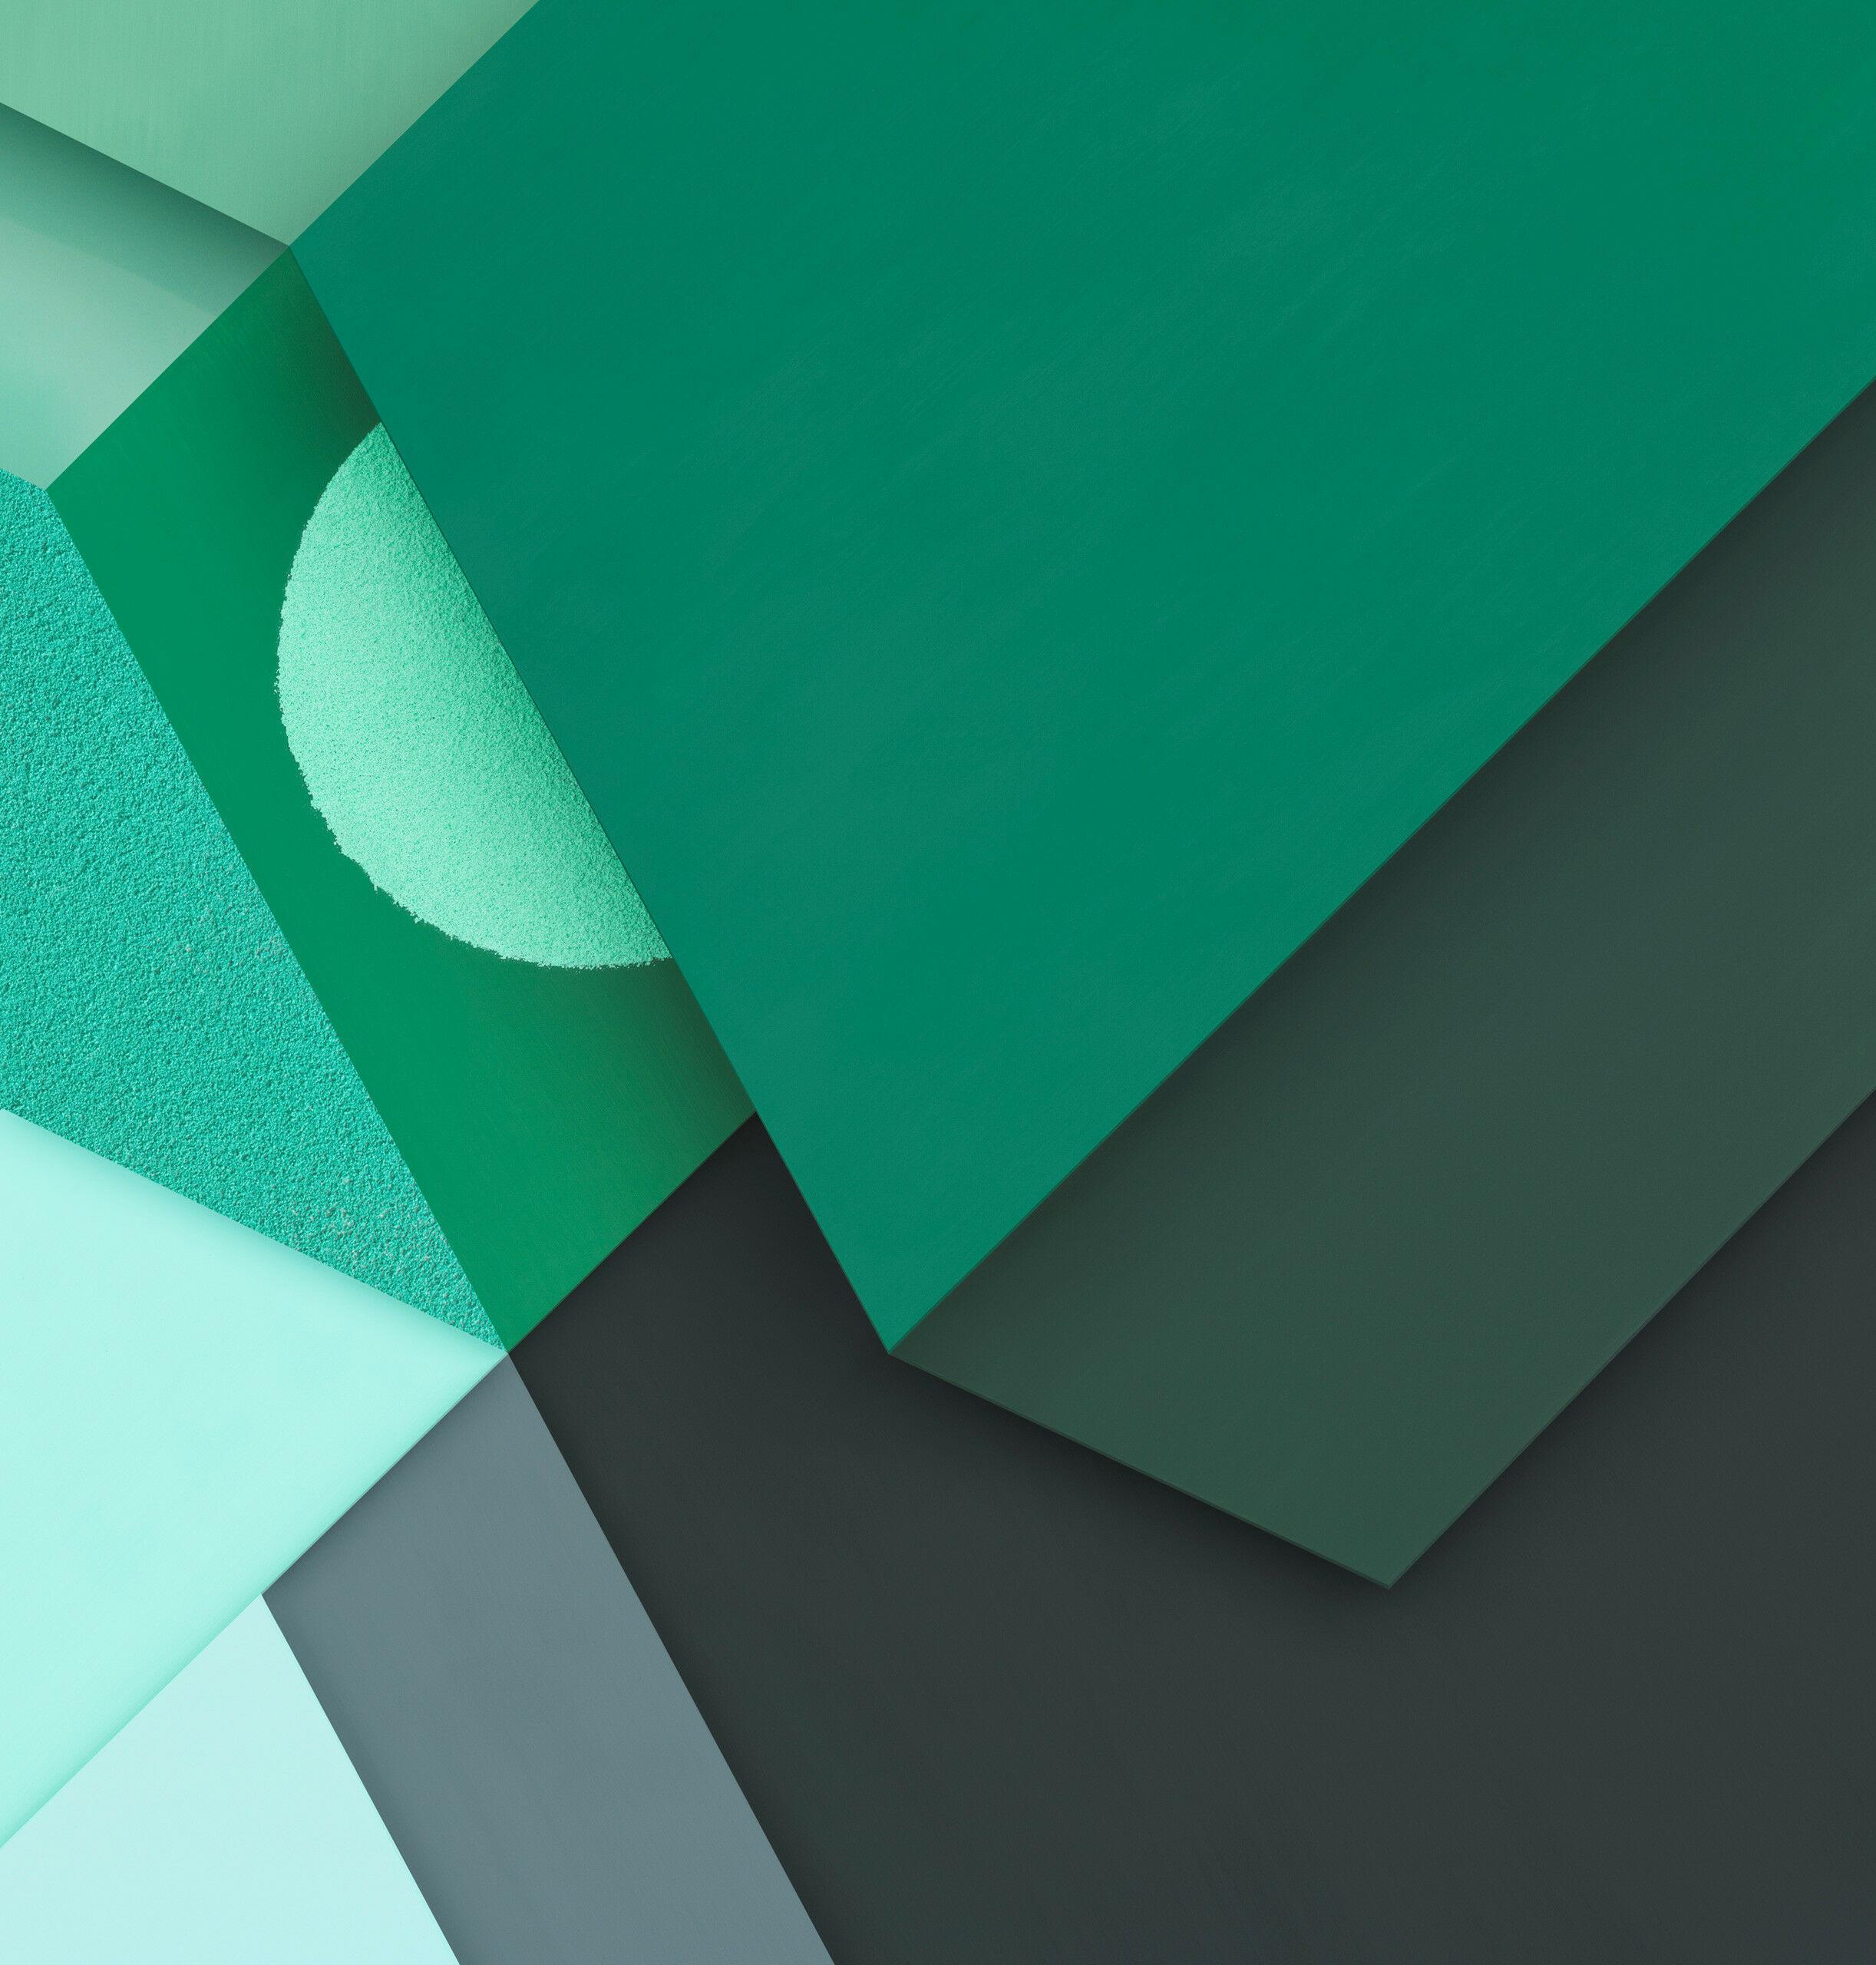 Download Sekarang Inilah 9 Wallpaper HD Android 60 Marshmallow